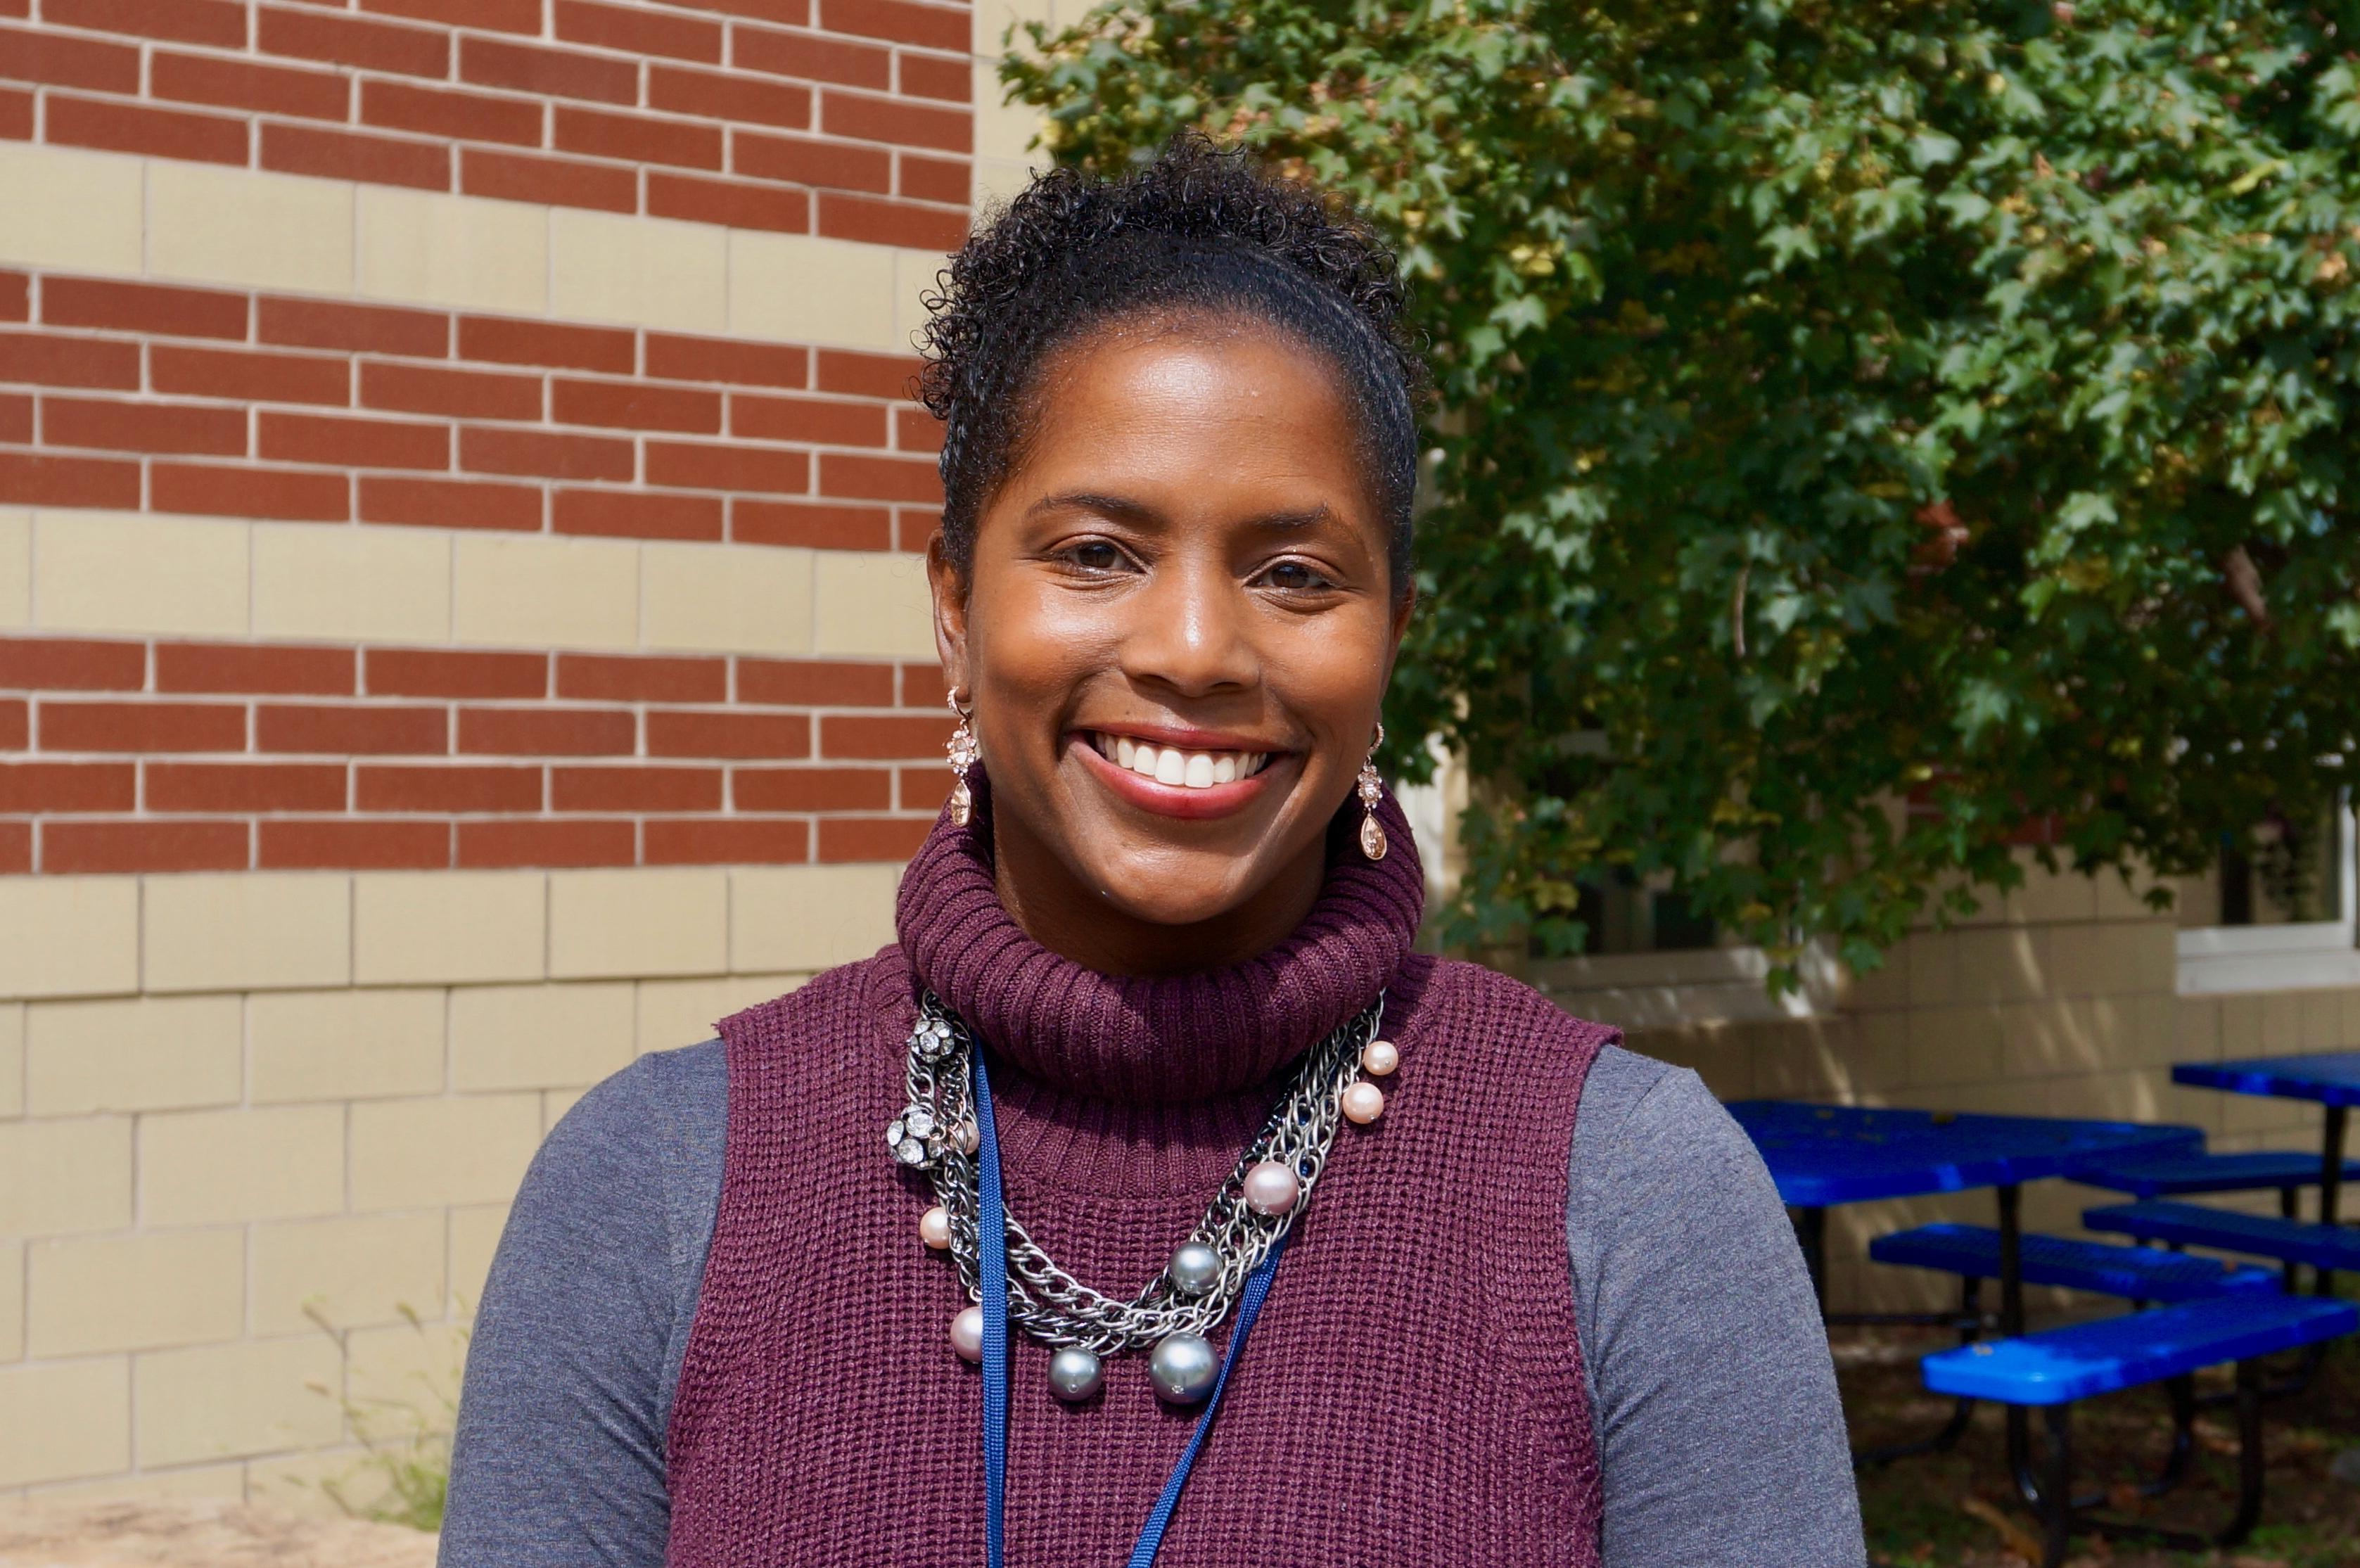 Mariama Carson is founding principal of Global Prep Academy at School 44.